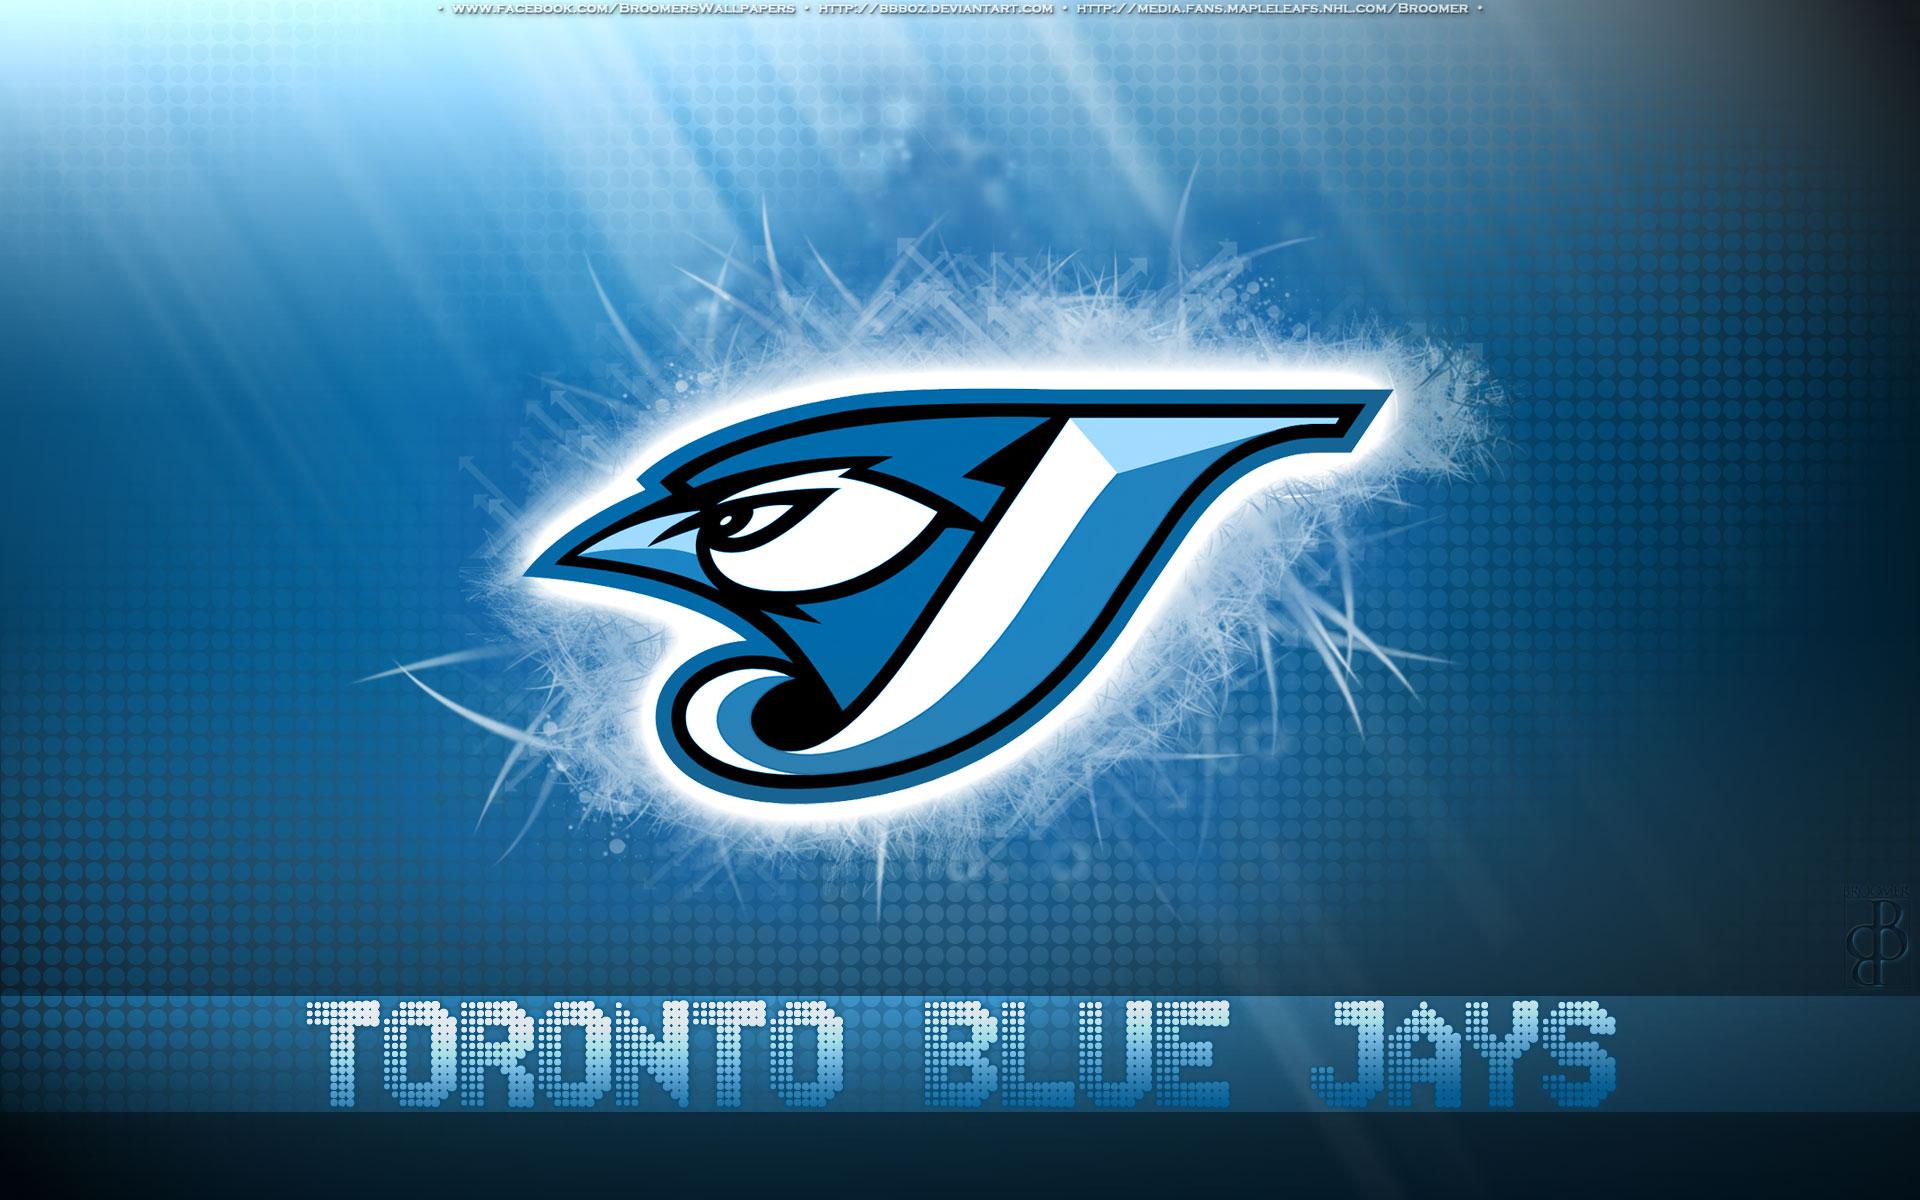 TORONTO BLUE JAYS mlb baseball 11 wallpaper 1920x1200 228024 1920x1200